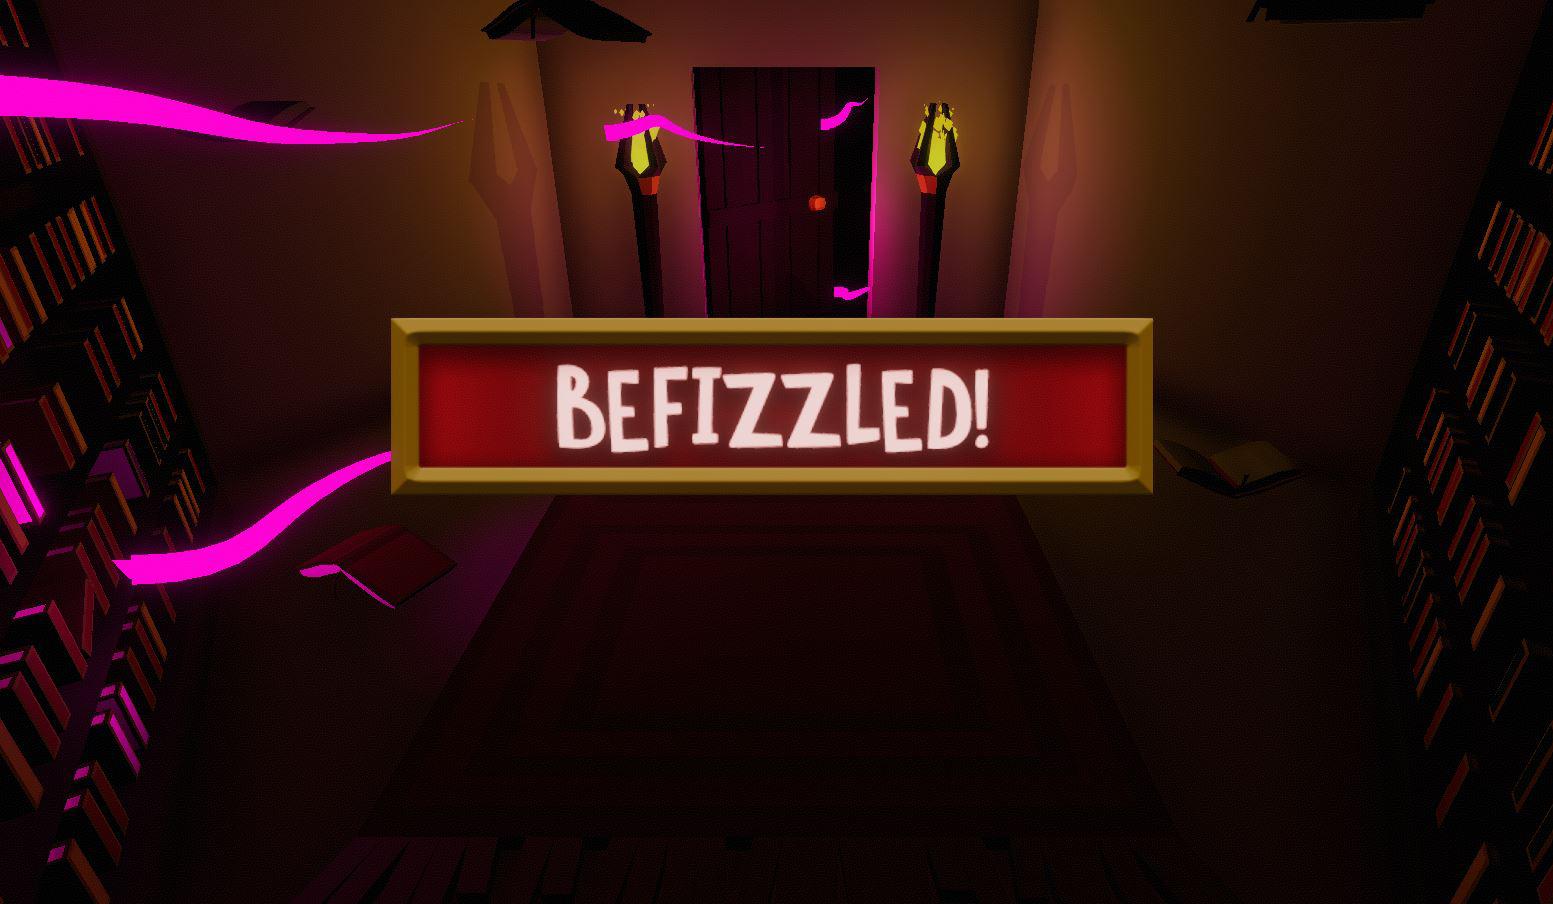 Befizzled!